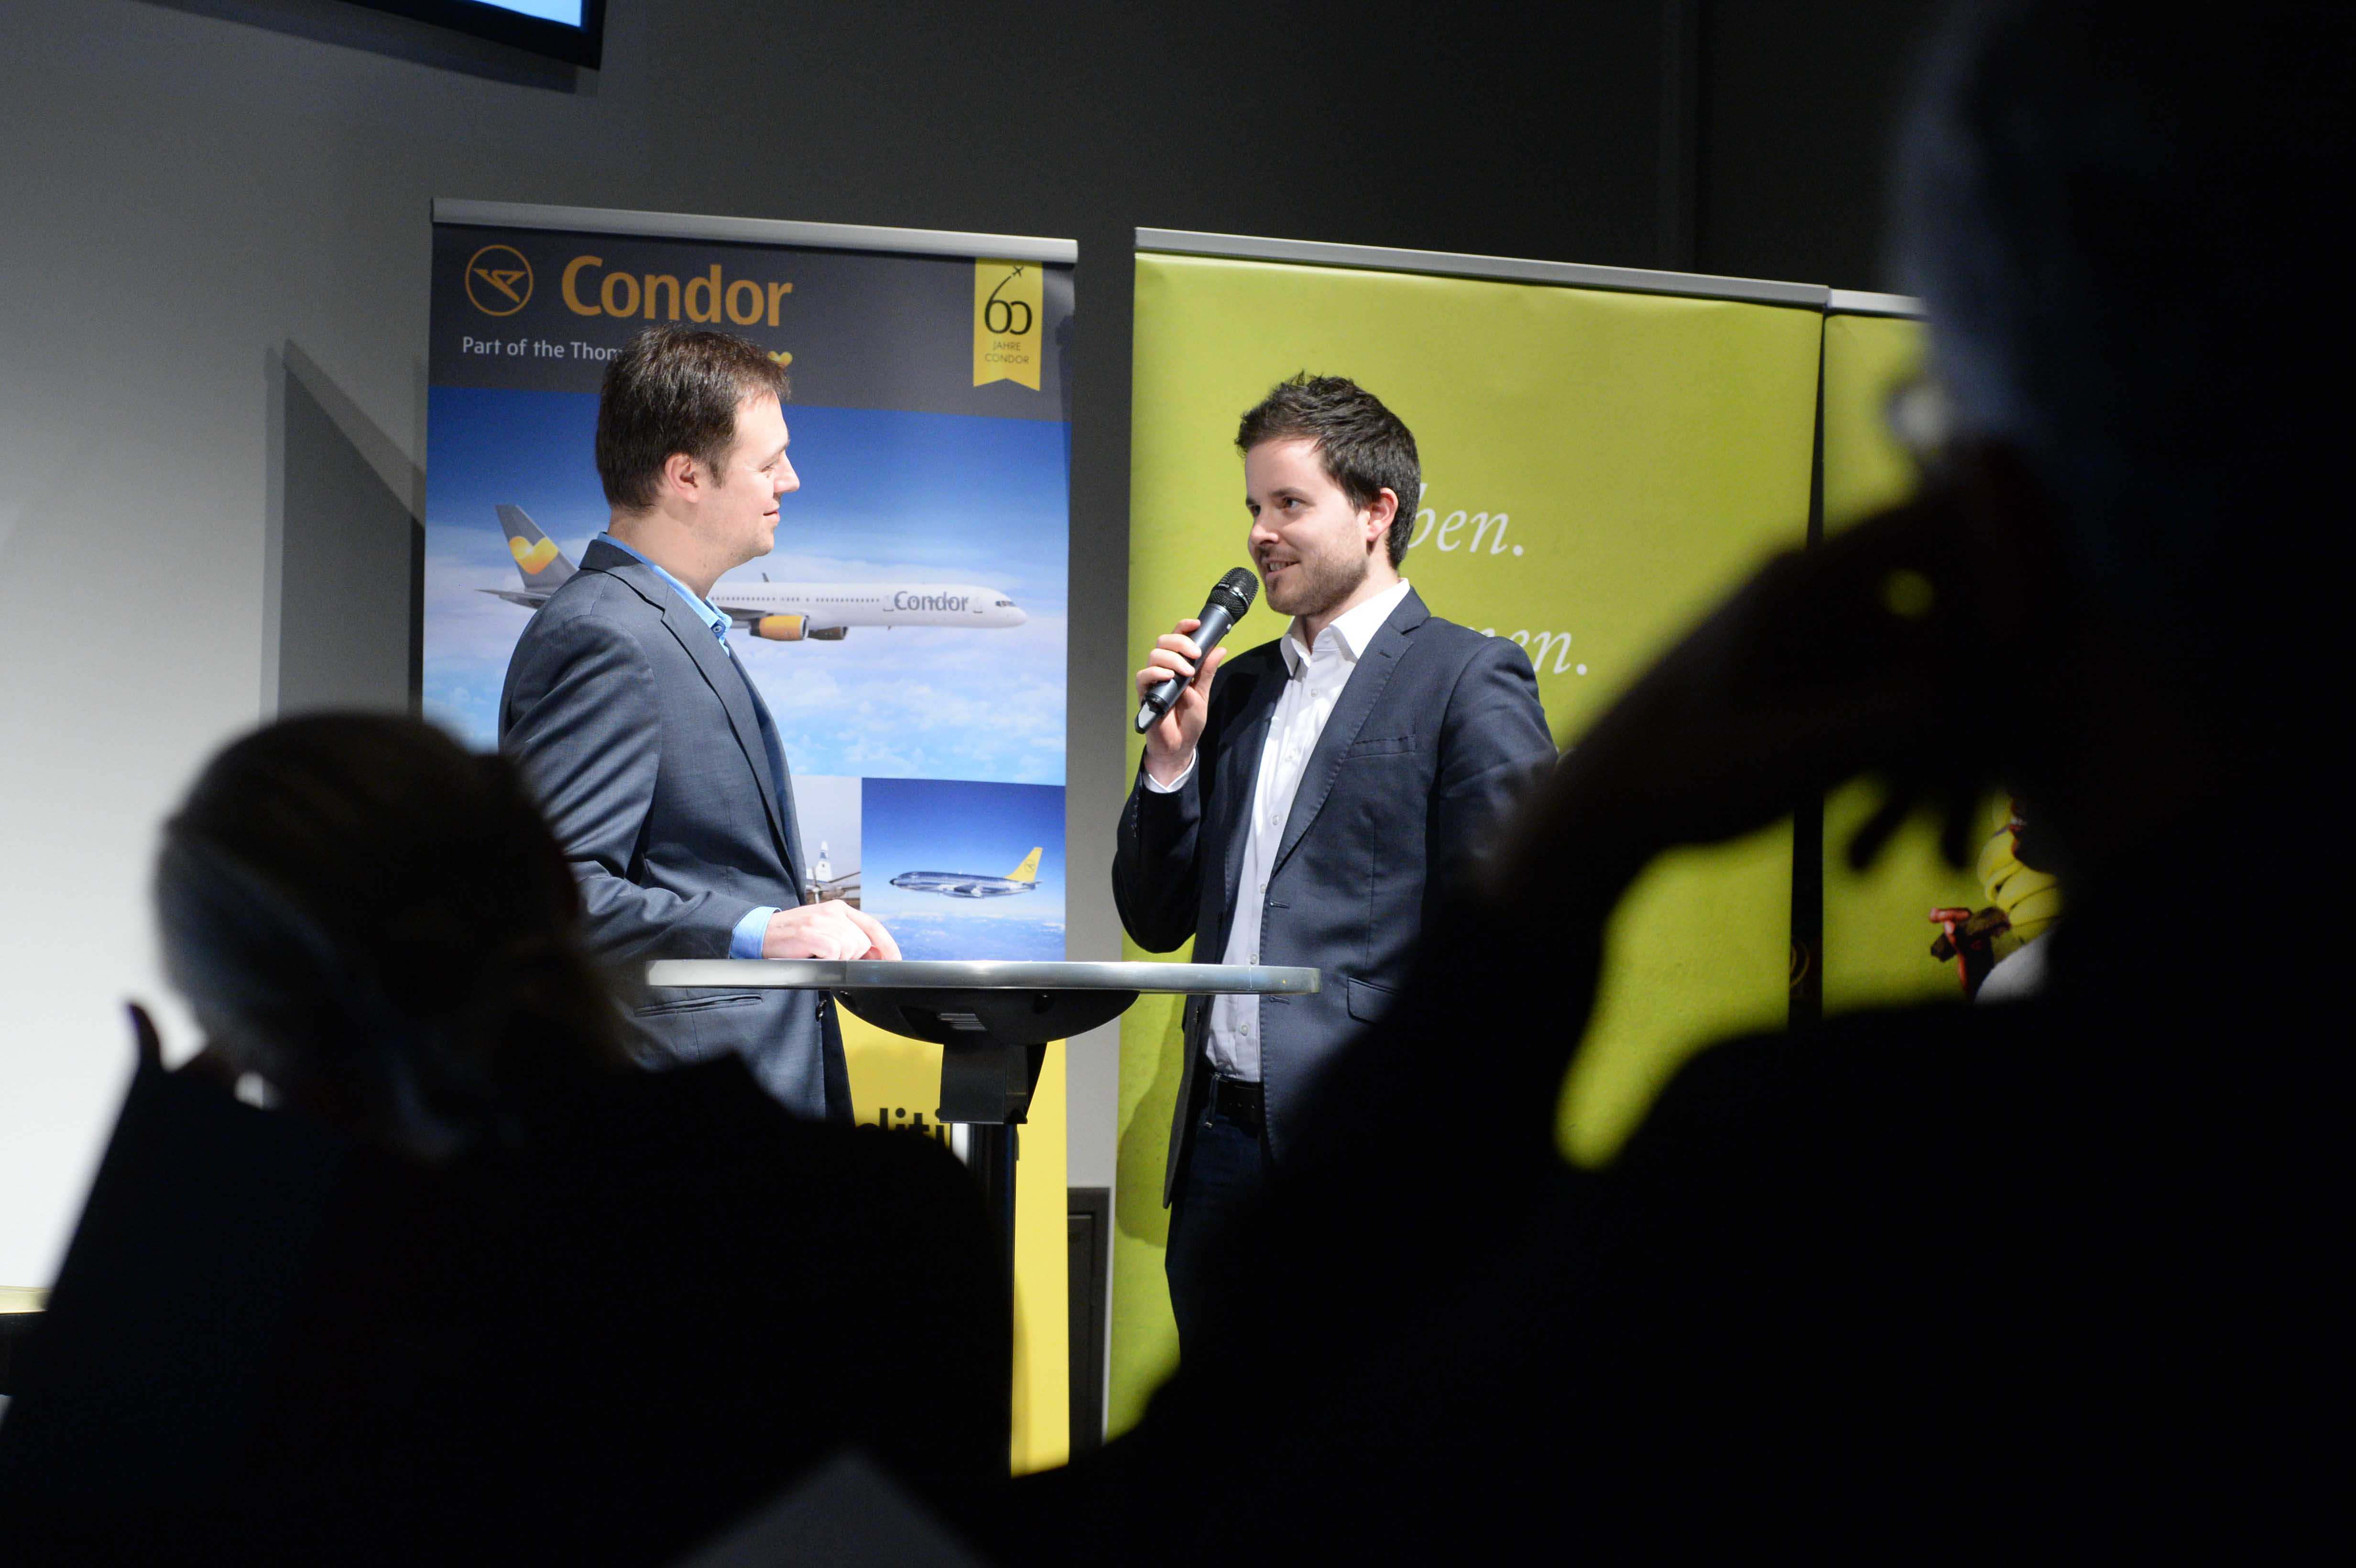 Columbus Autoren Preisverleihung 2015 Christopher Piltz Gold Talk mit Christian Leetz 2 web